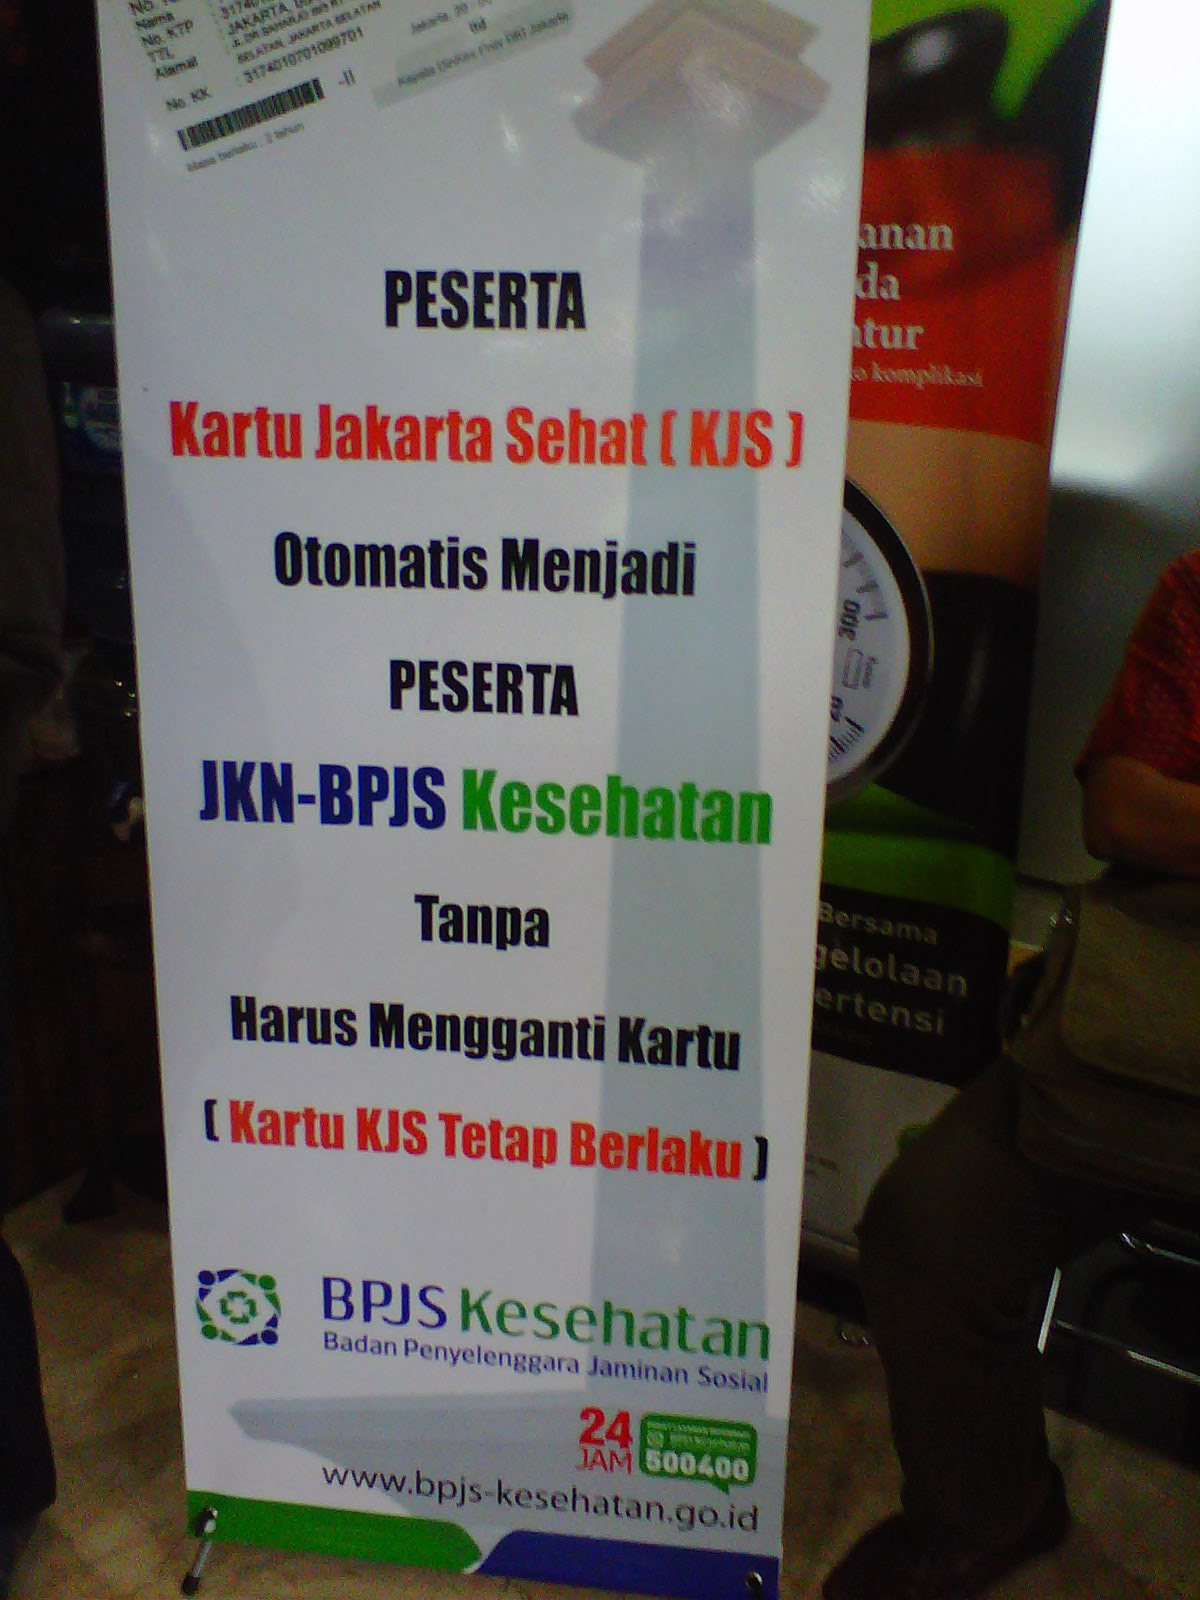 Kartu Jakarta Sehat menjadi JKN - BPJS Kesehatan